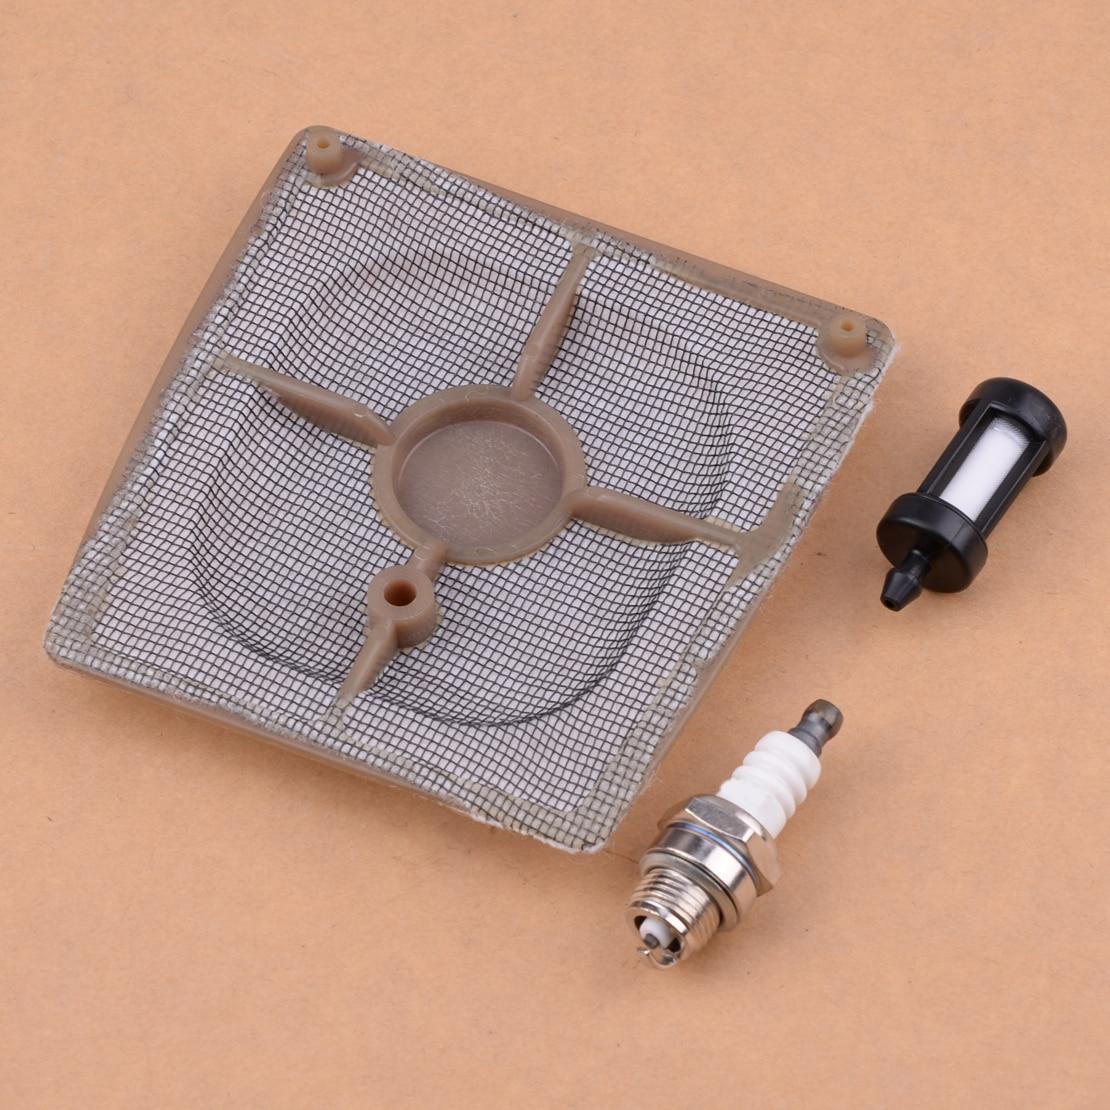 LETAOSK Carburetor Air Fuel & Line Filter & Spark Plug Tool Fit For STIHL 041 Farm Boss Gas Carb Chainsaw 1110-120-1601